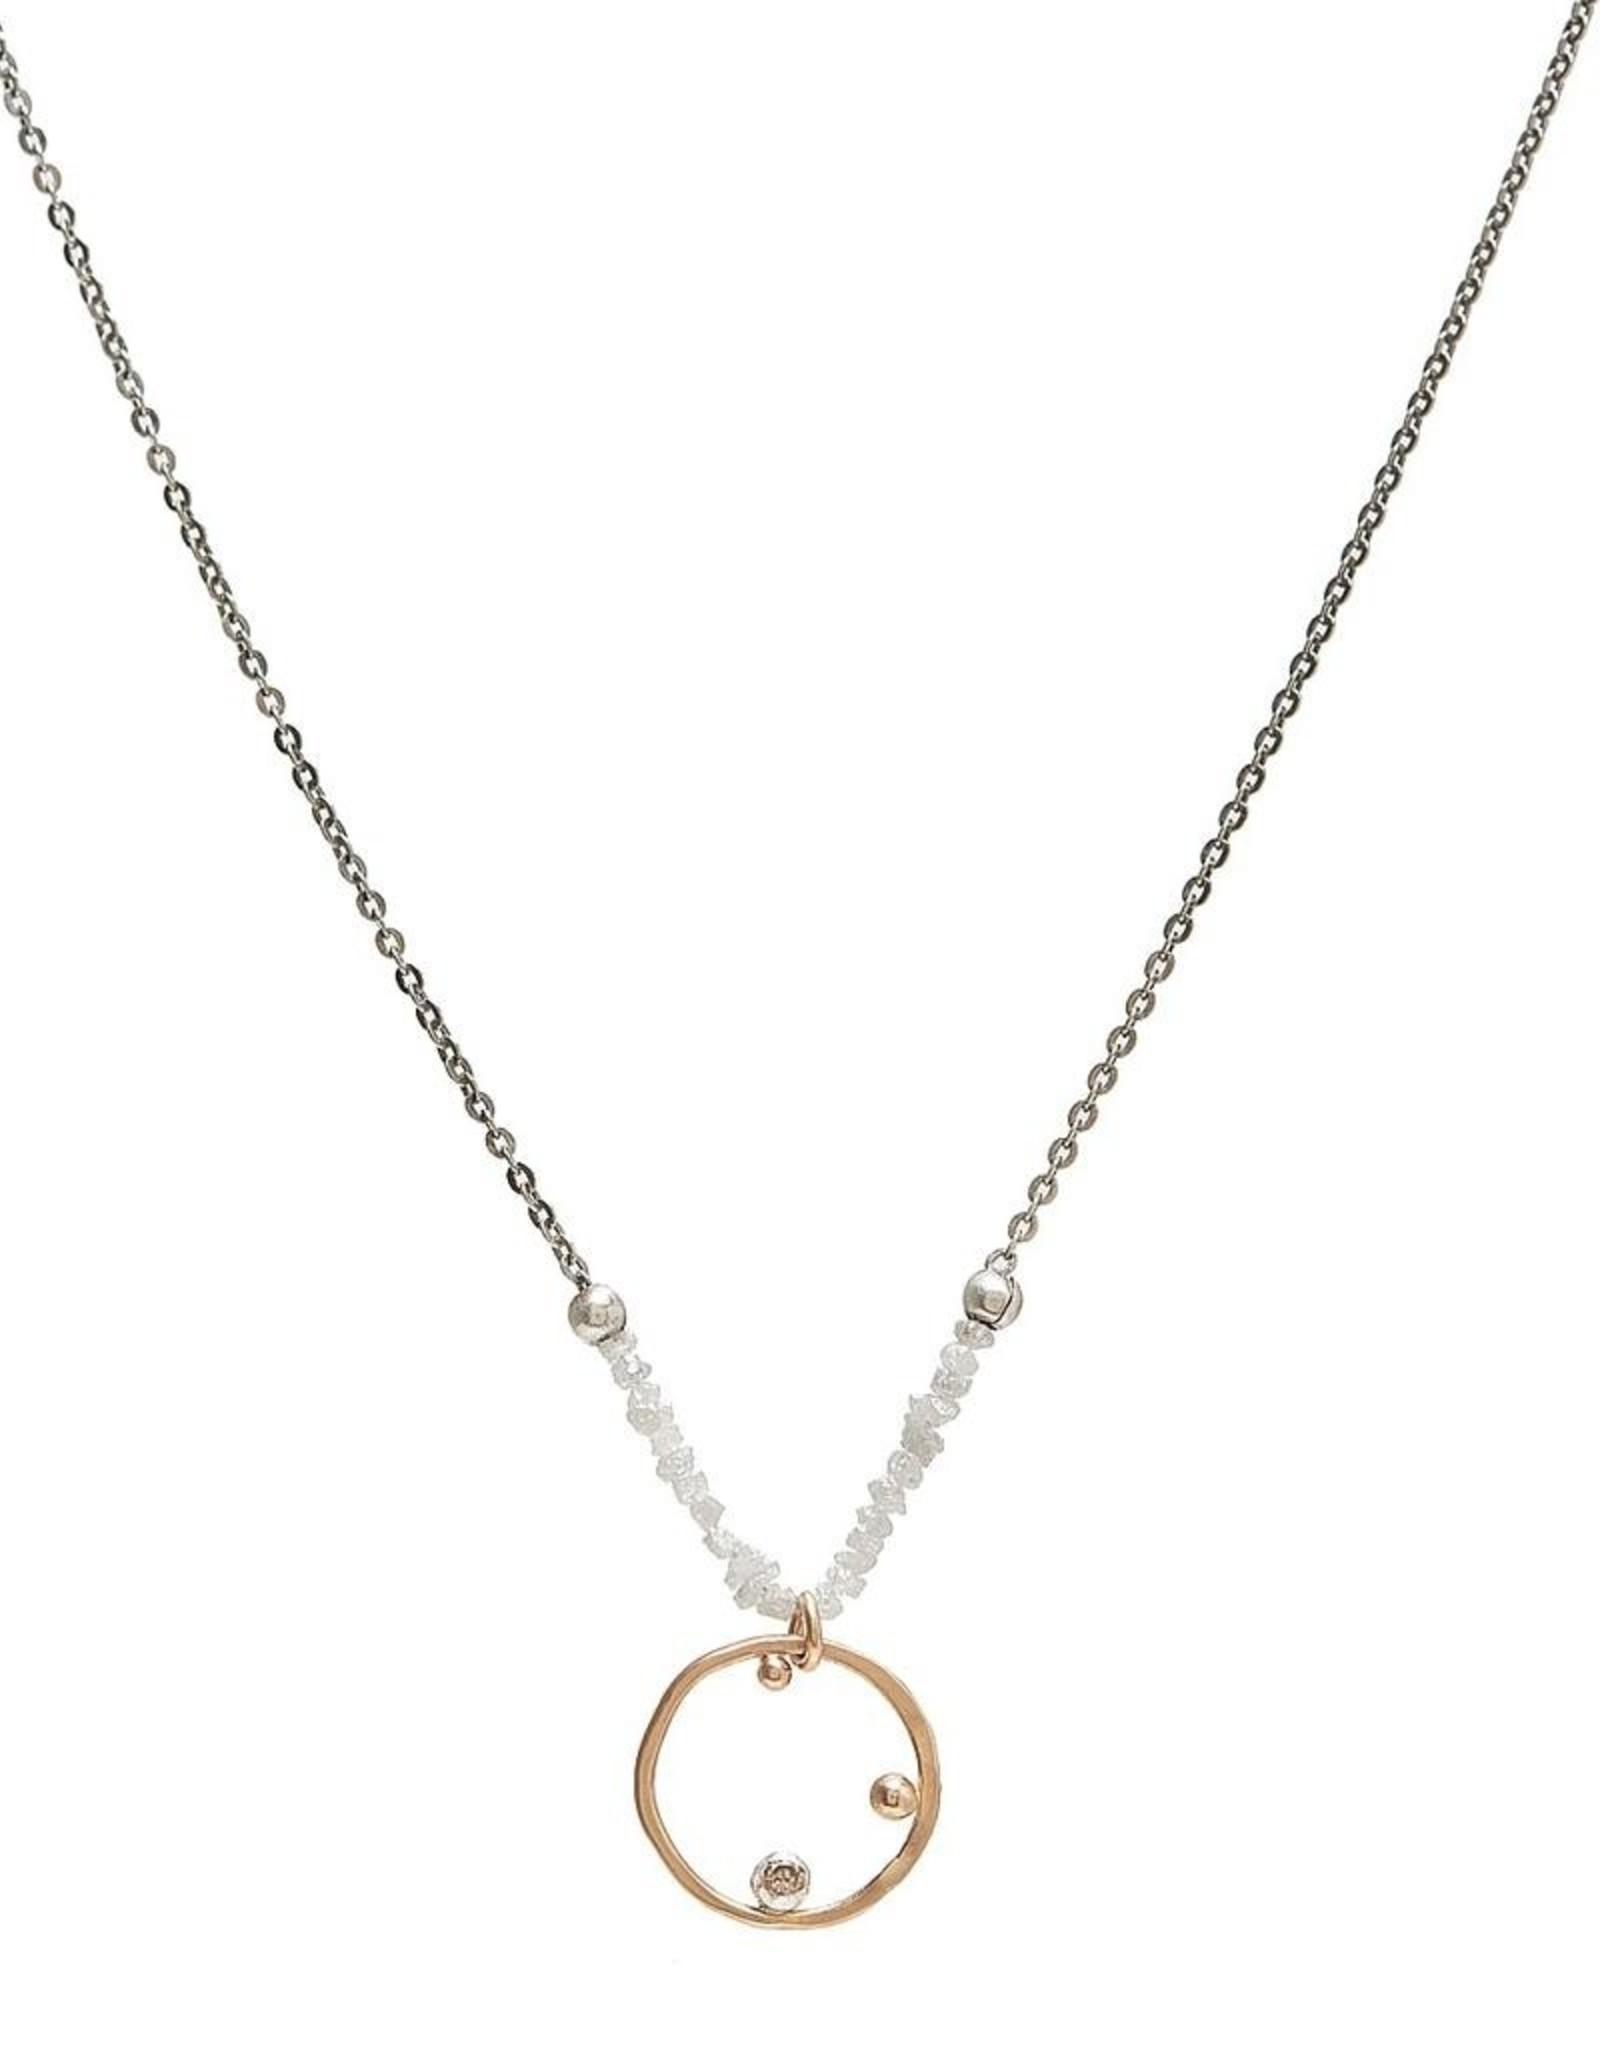 "Handmade 14k Goldfill Pendant with 2.1mm Chocolate Diamond on White Diamond Chip Necklace, 18"""